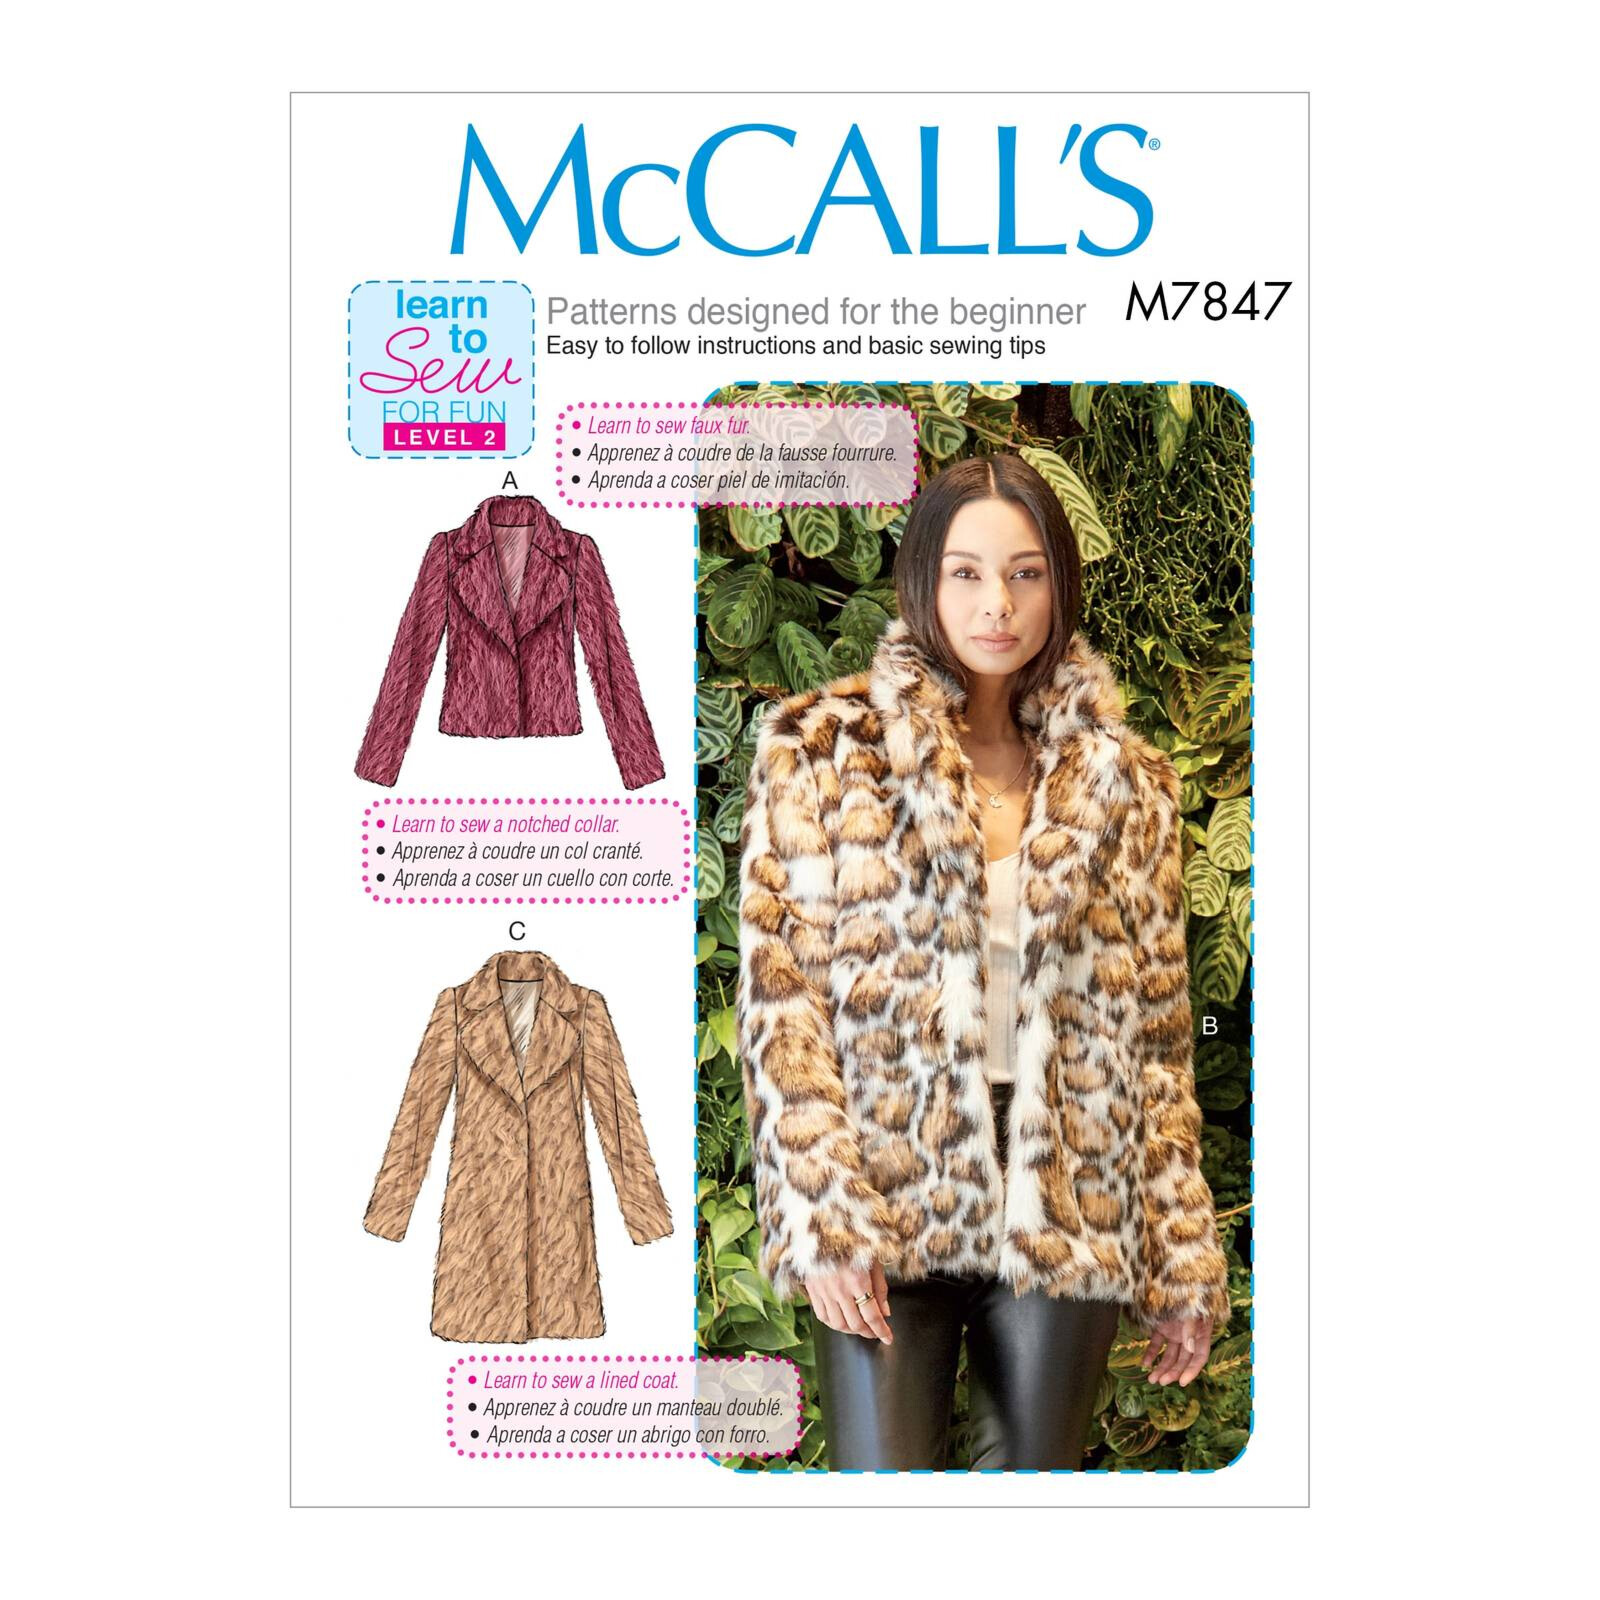 McCall's 7847